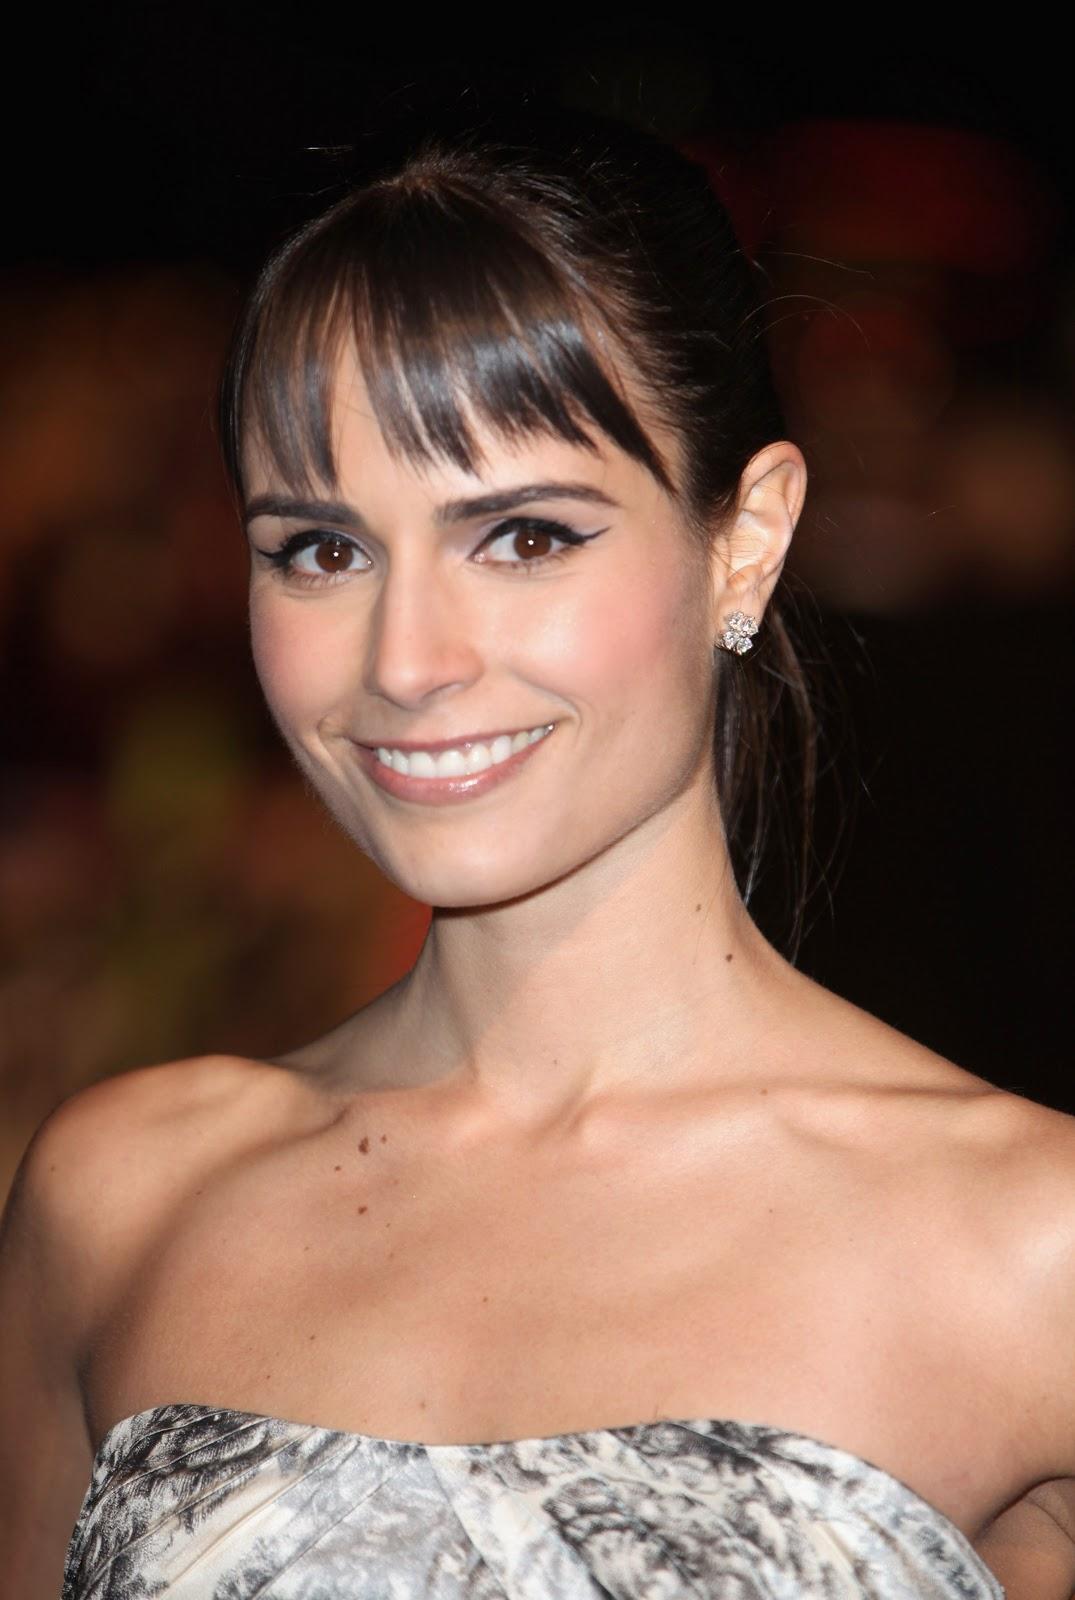 7 Furious And Actress Fast